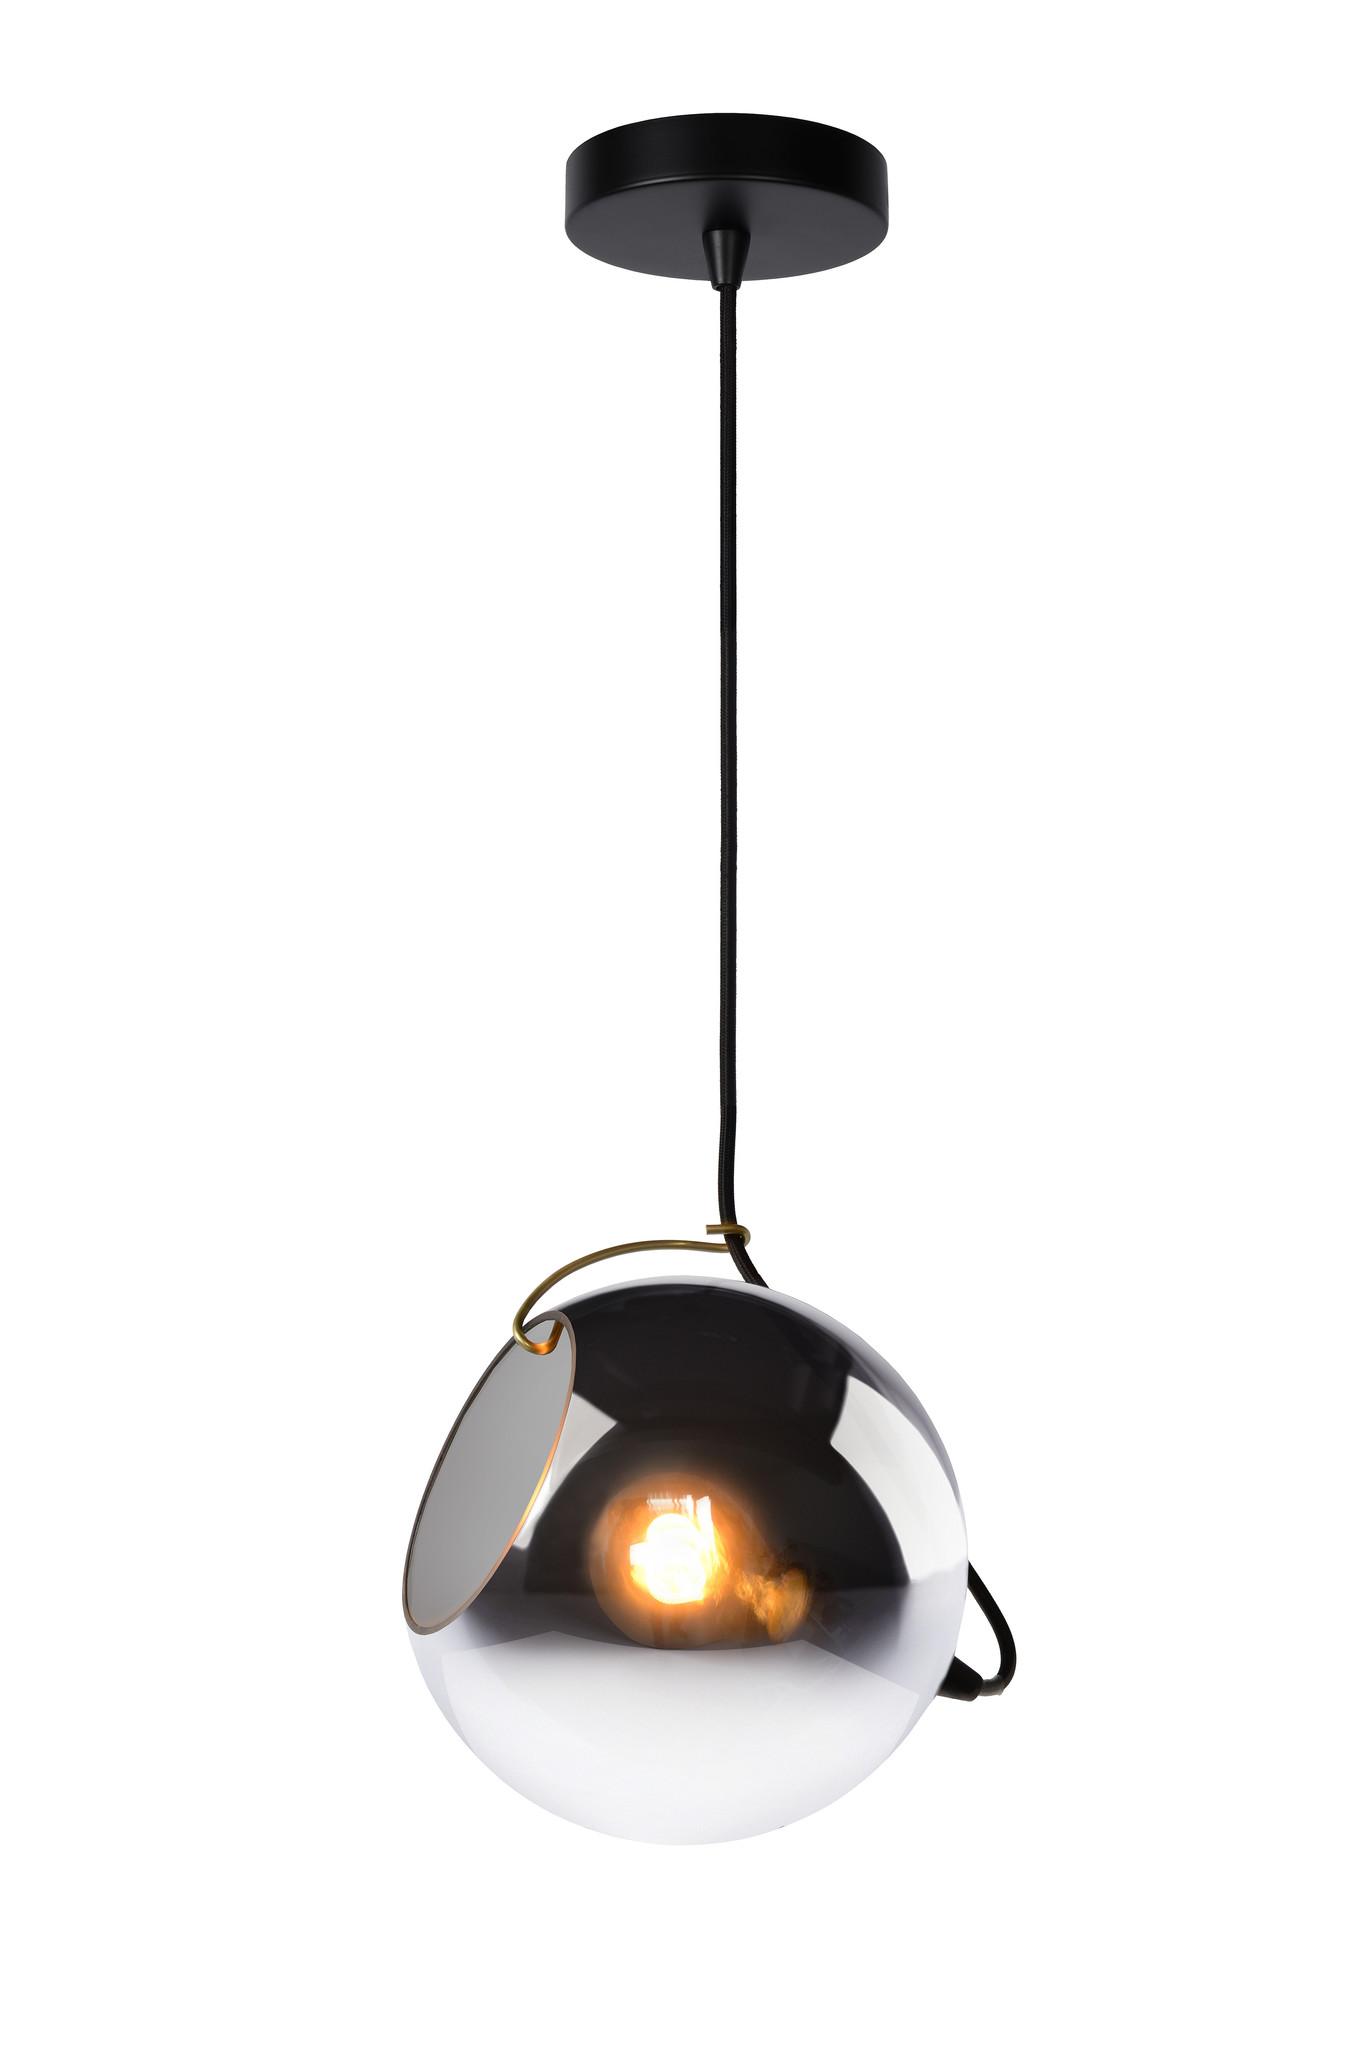 Lucide JAZZLYNN Hanglamp-Fumé-Ø20-1xE27-60W-Glas